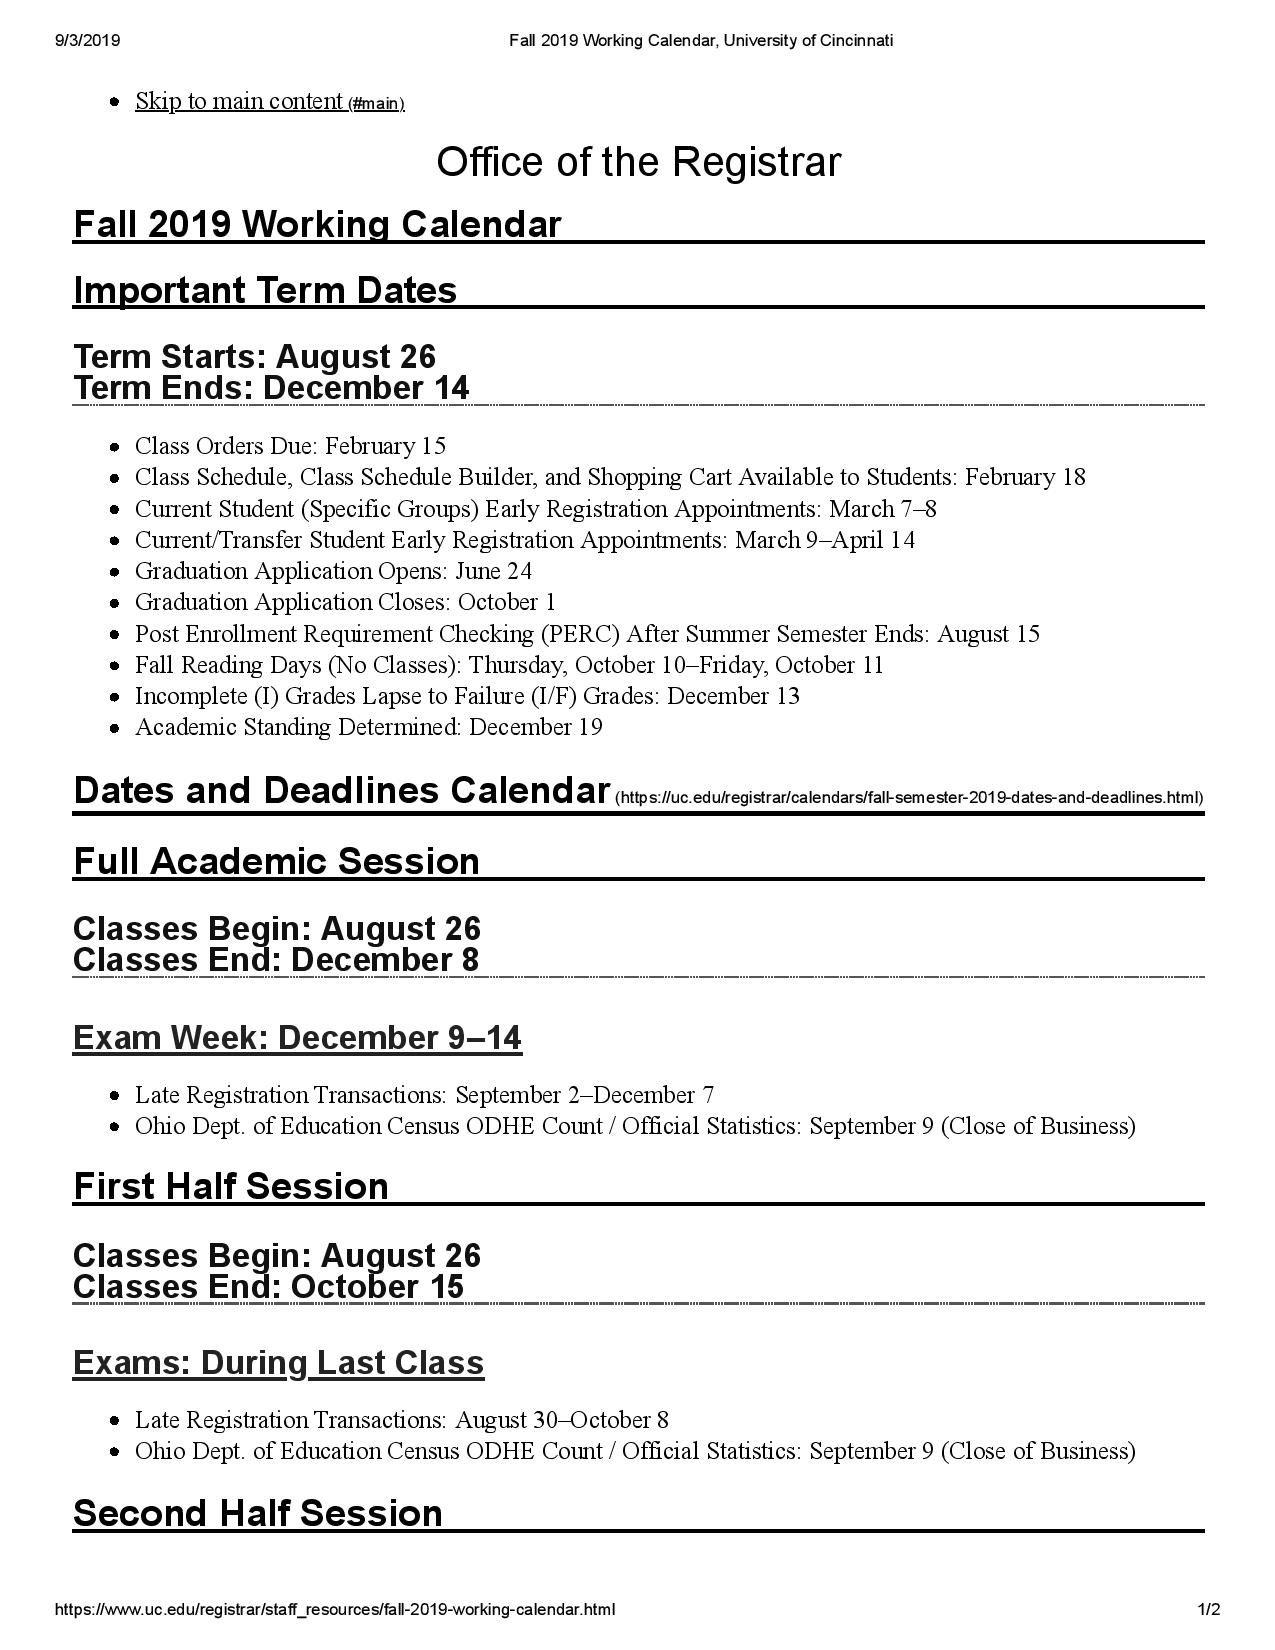 University Of Utah Academic Calendar Fall 2022.University Of Cincinnati Academic Calendar Images Https Www Youcalendars Com University Of Cincinn Academic Calendar University Of Cincinnati Class Schedule